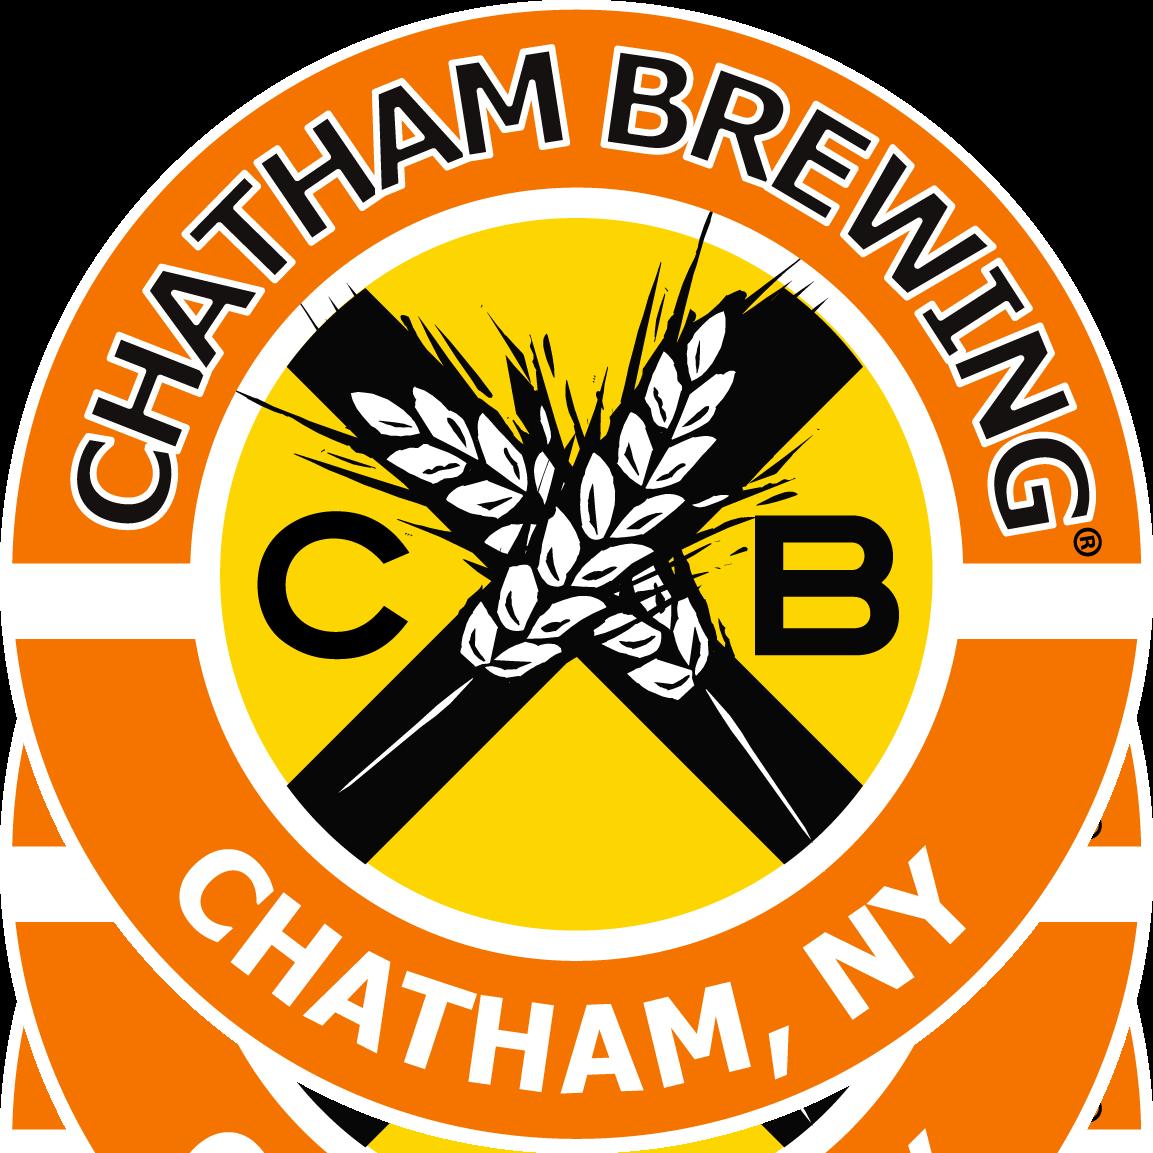 chatham brewing logo